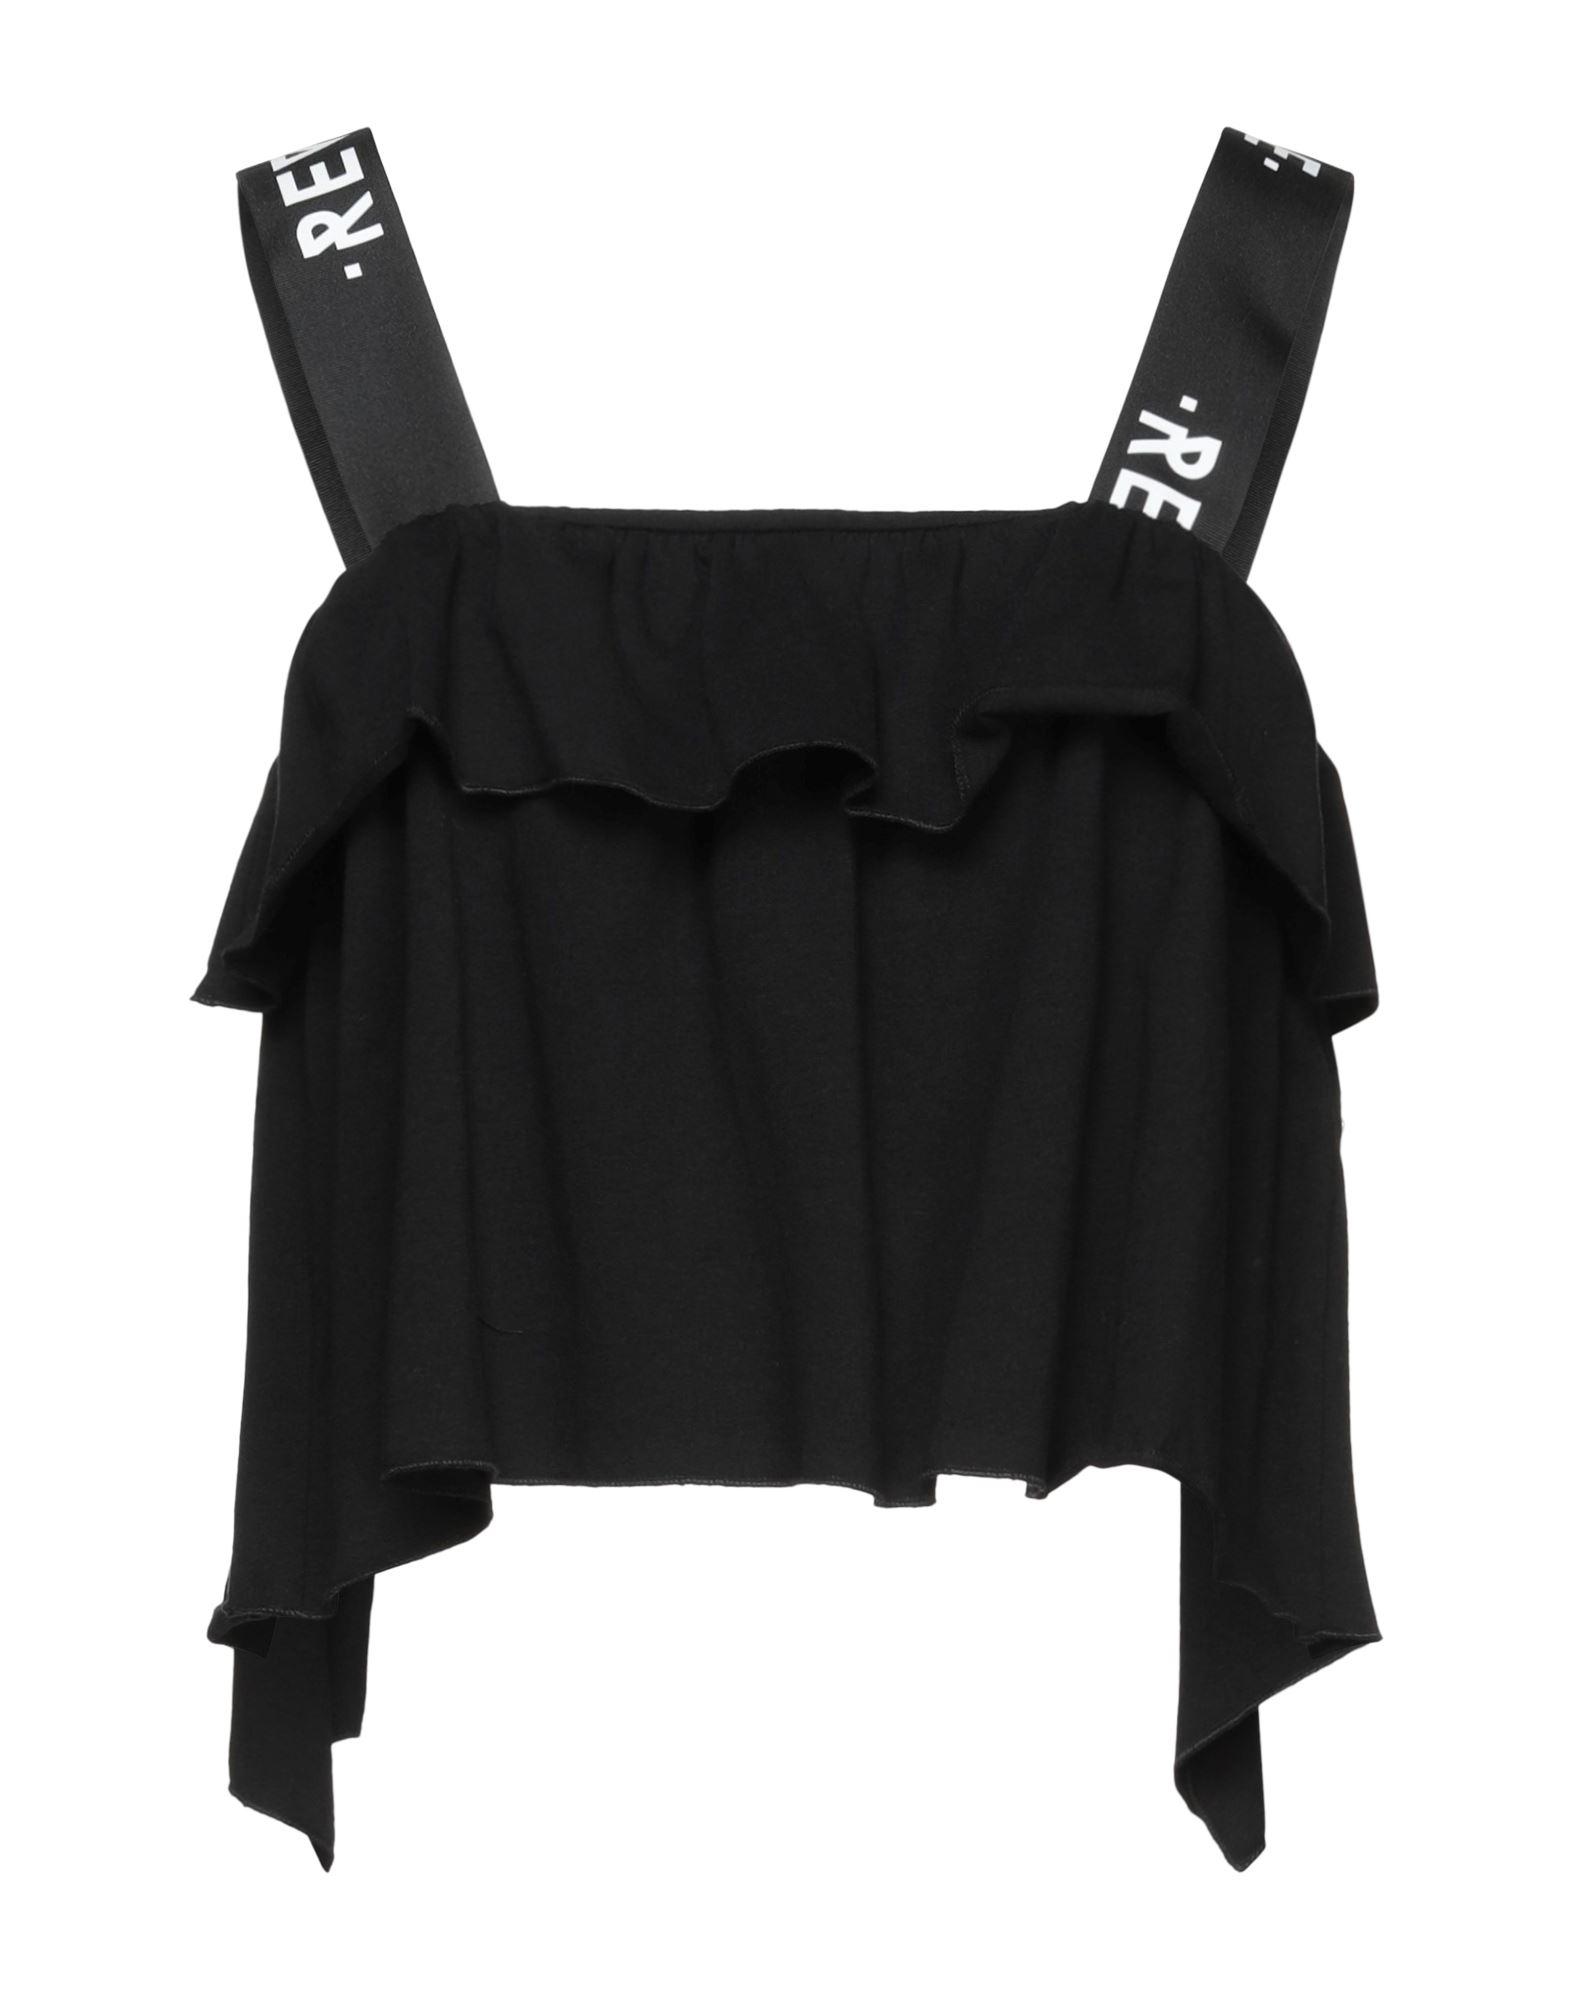 блузка с принтом без рукавов tuto REVISE Топ без рукавов